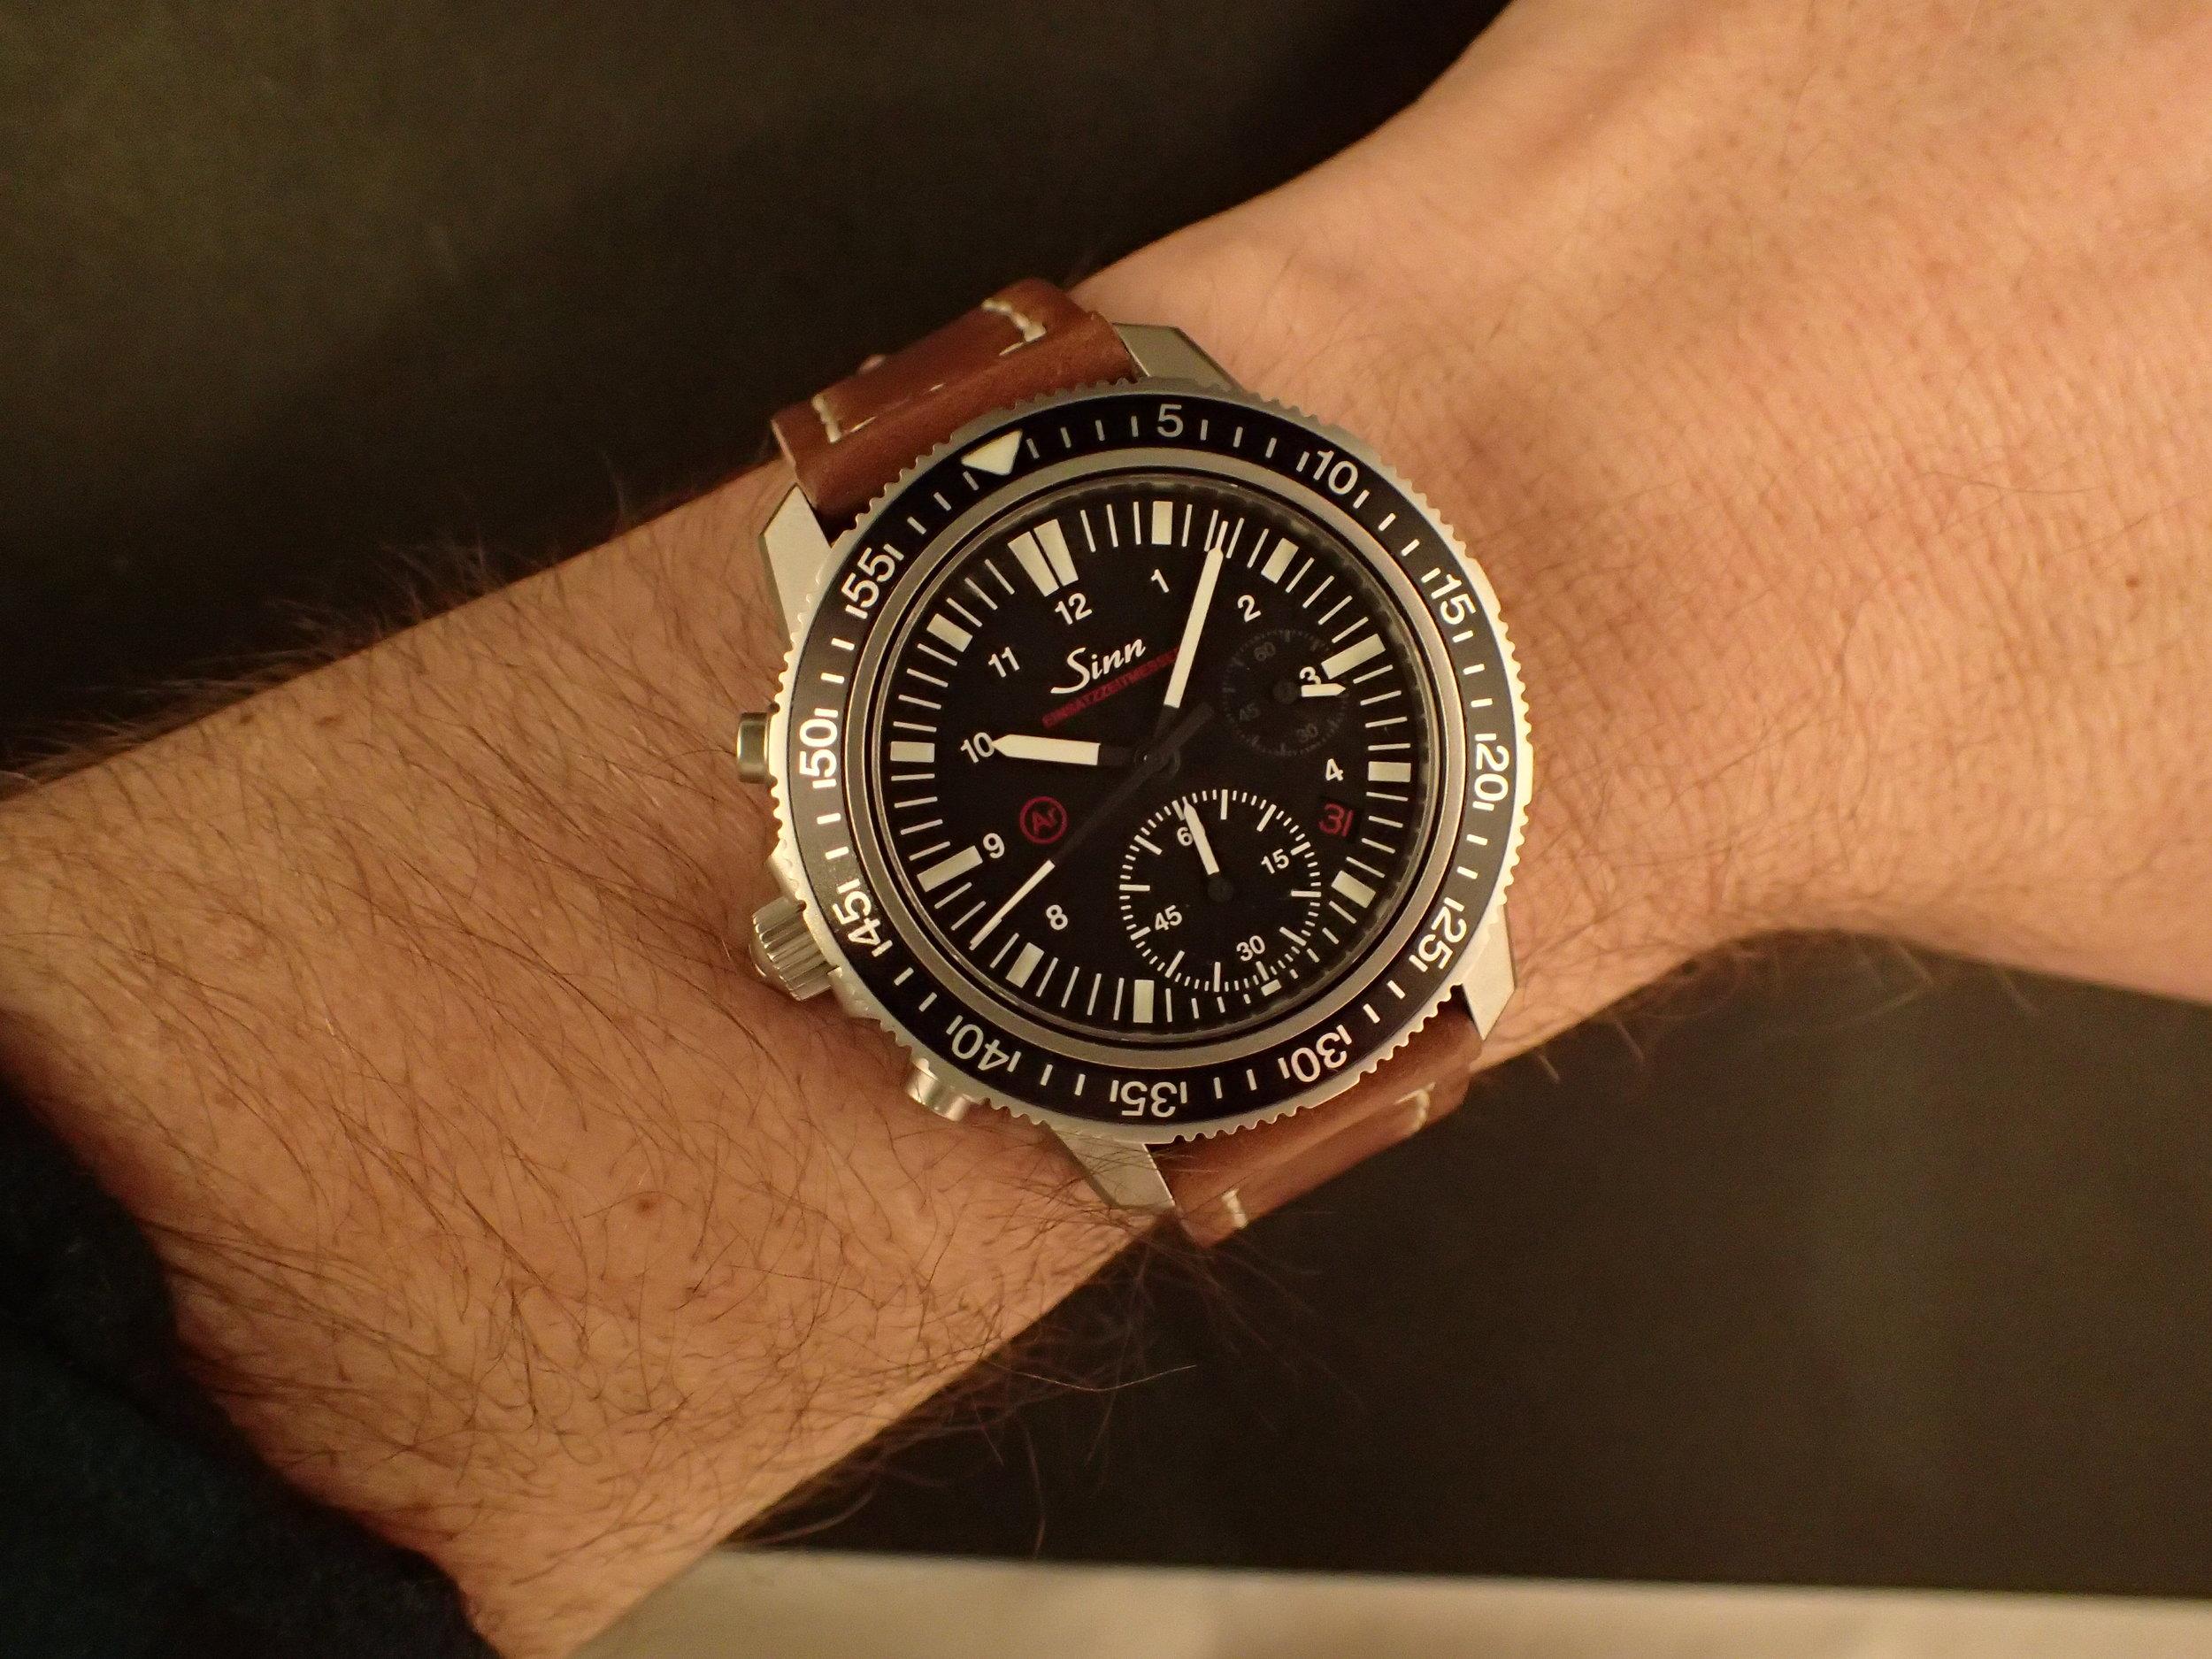 The wristwatch equivalent of Polio braces?